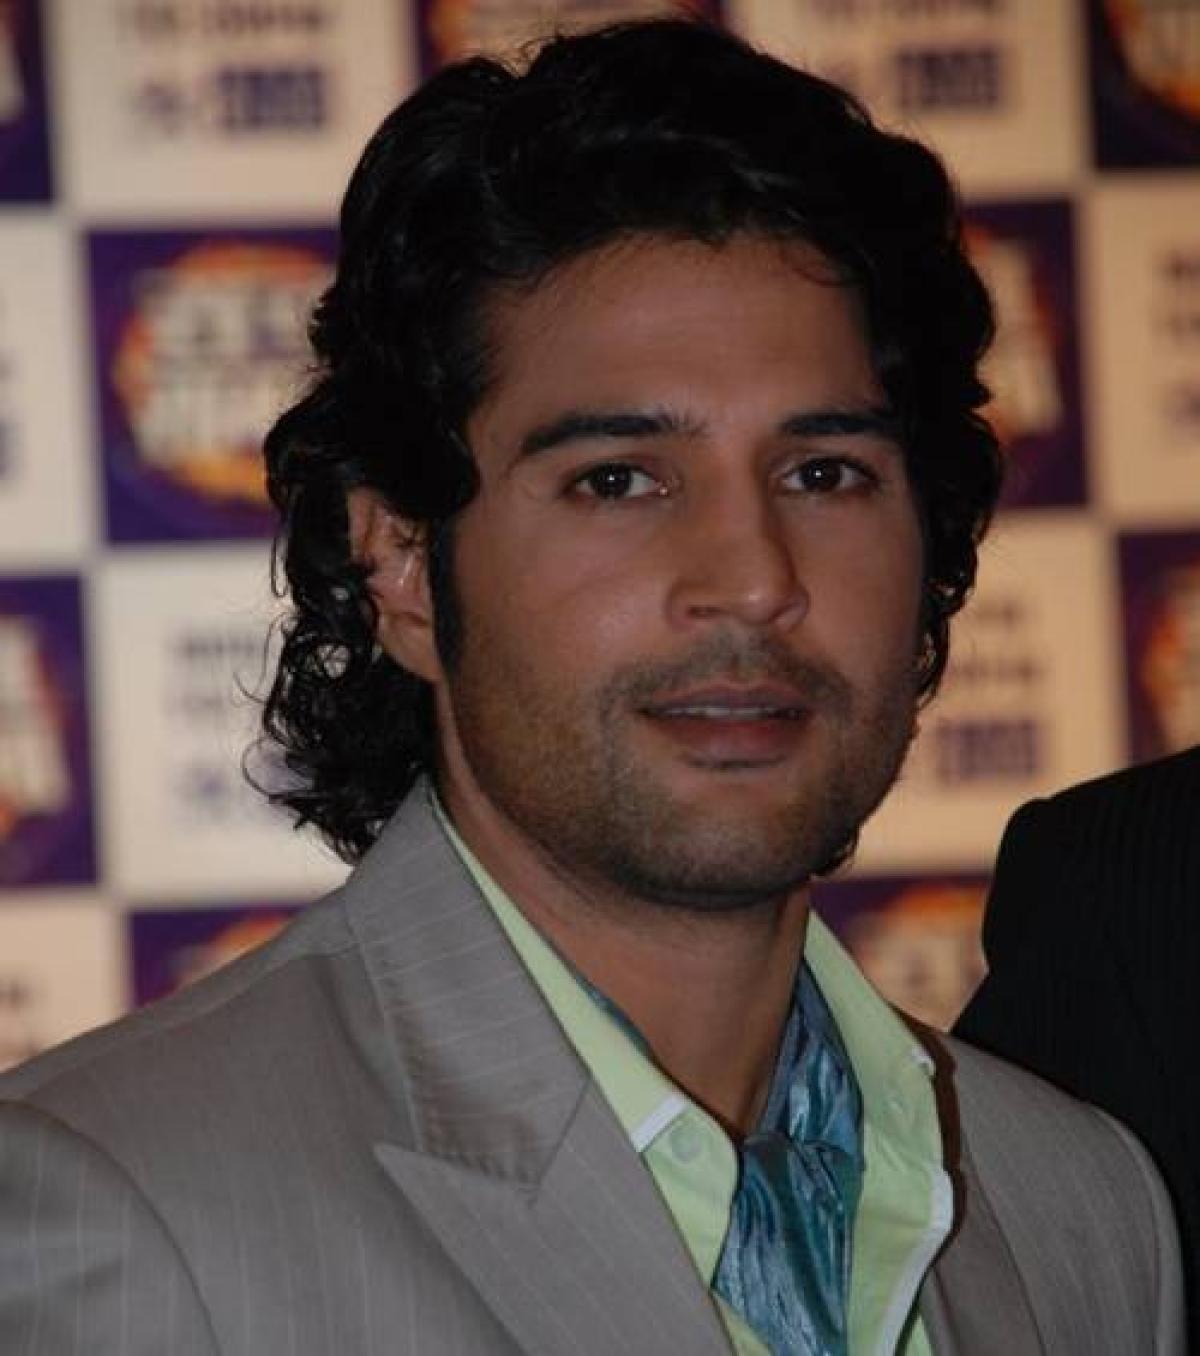 Intimate scenes in 'Fever' not forced: Rajeev Khandelwal